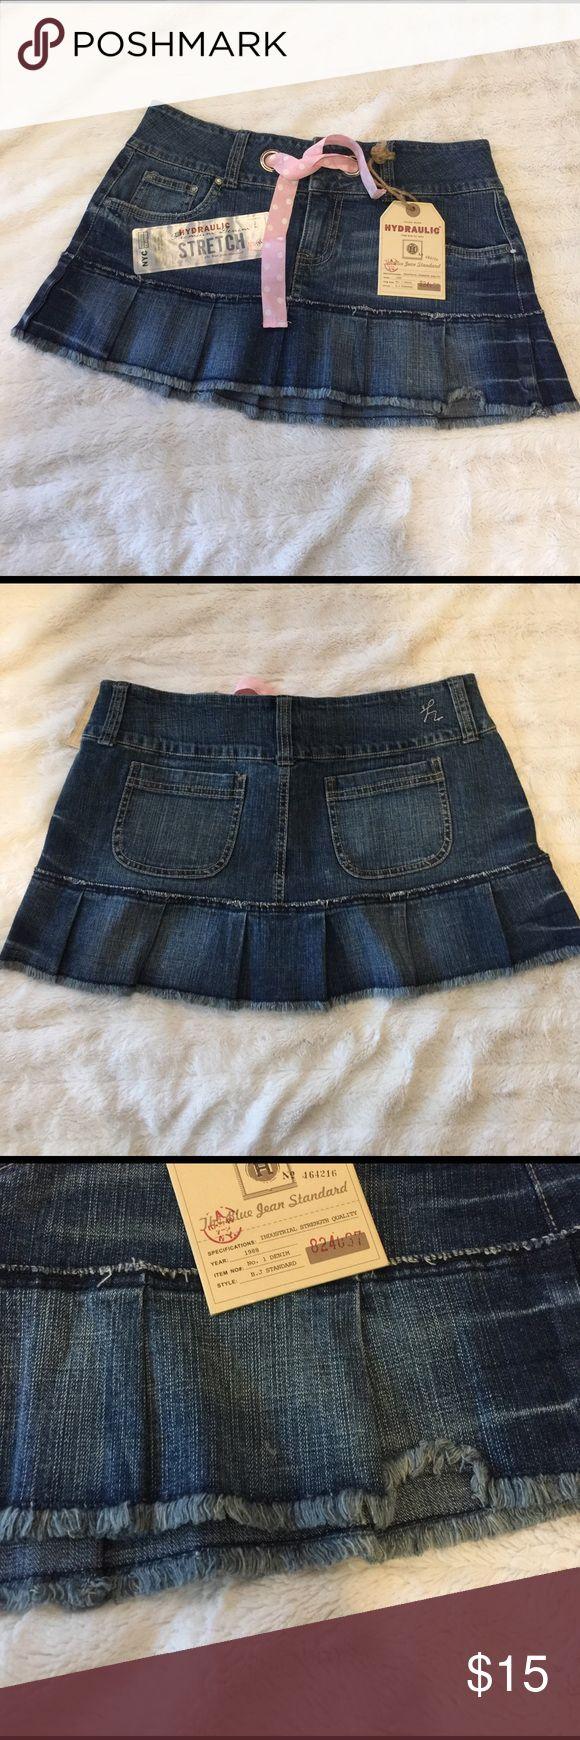 NWT Hydraulic Jean Skirt🌟 Super cute NWT hydraulic jean skirt, thanks for looking 😊 Hydraulic Skirts Midi